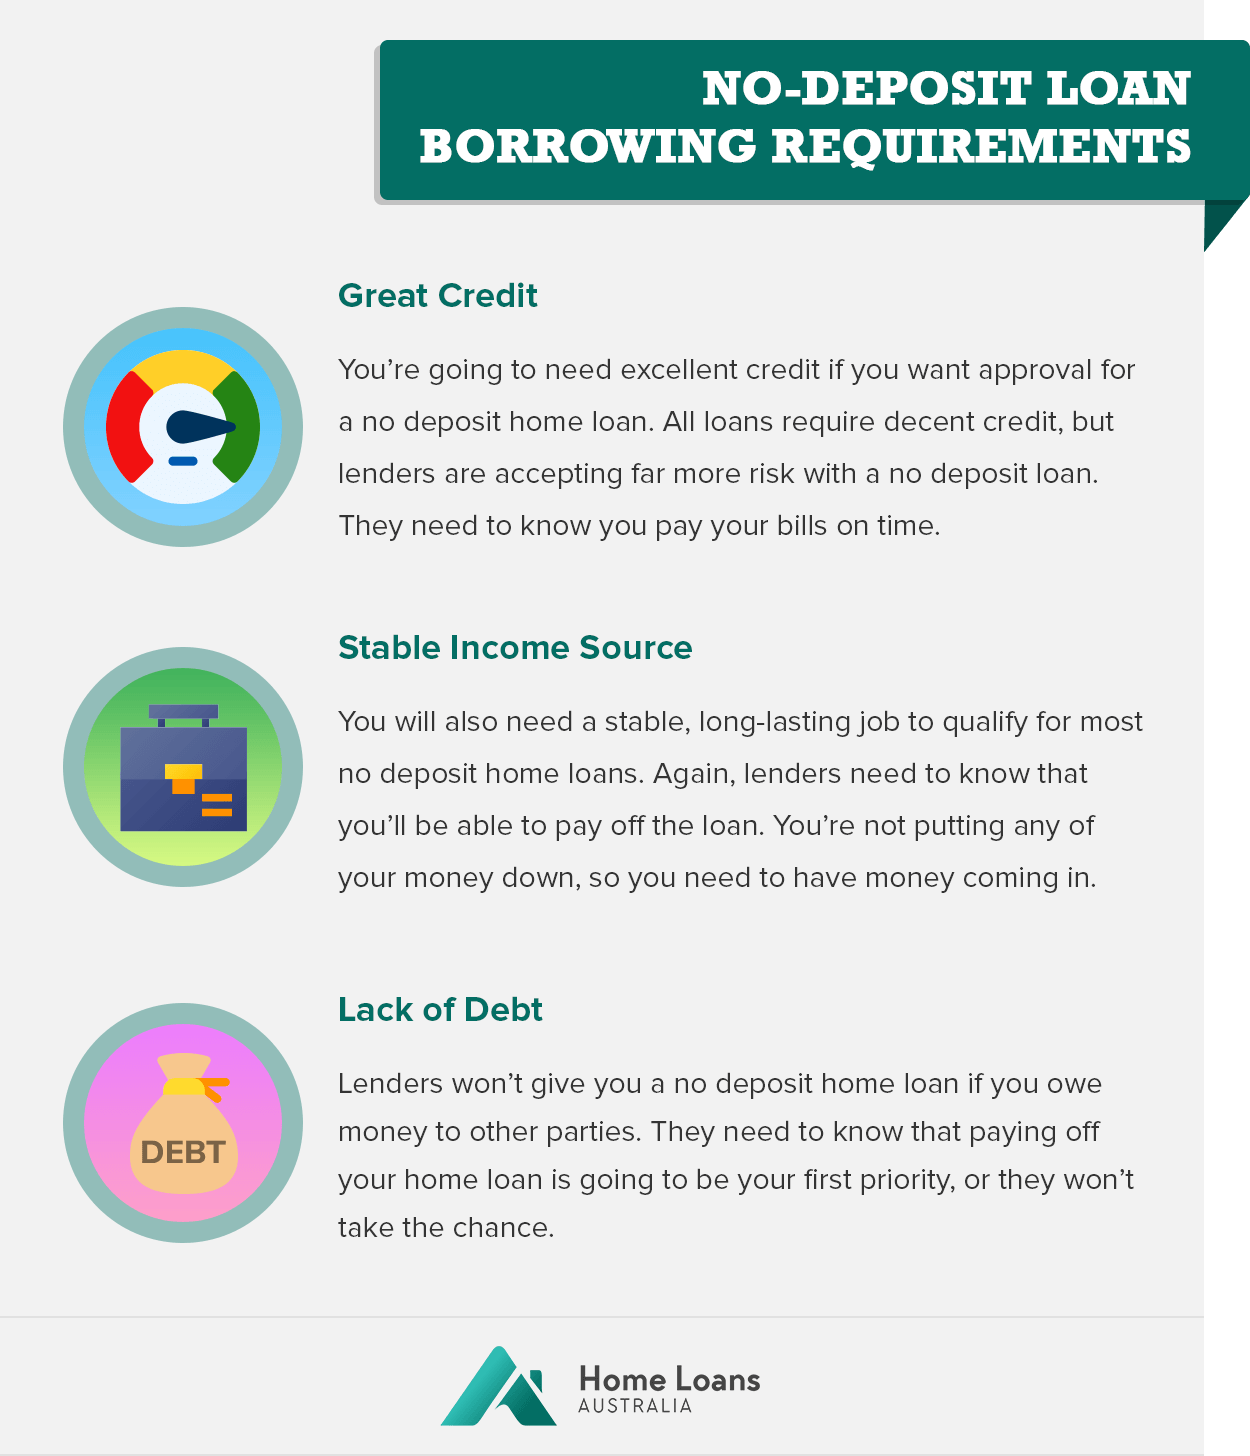 no-deposit loan borrowing requirements